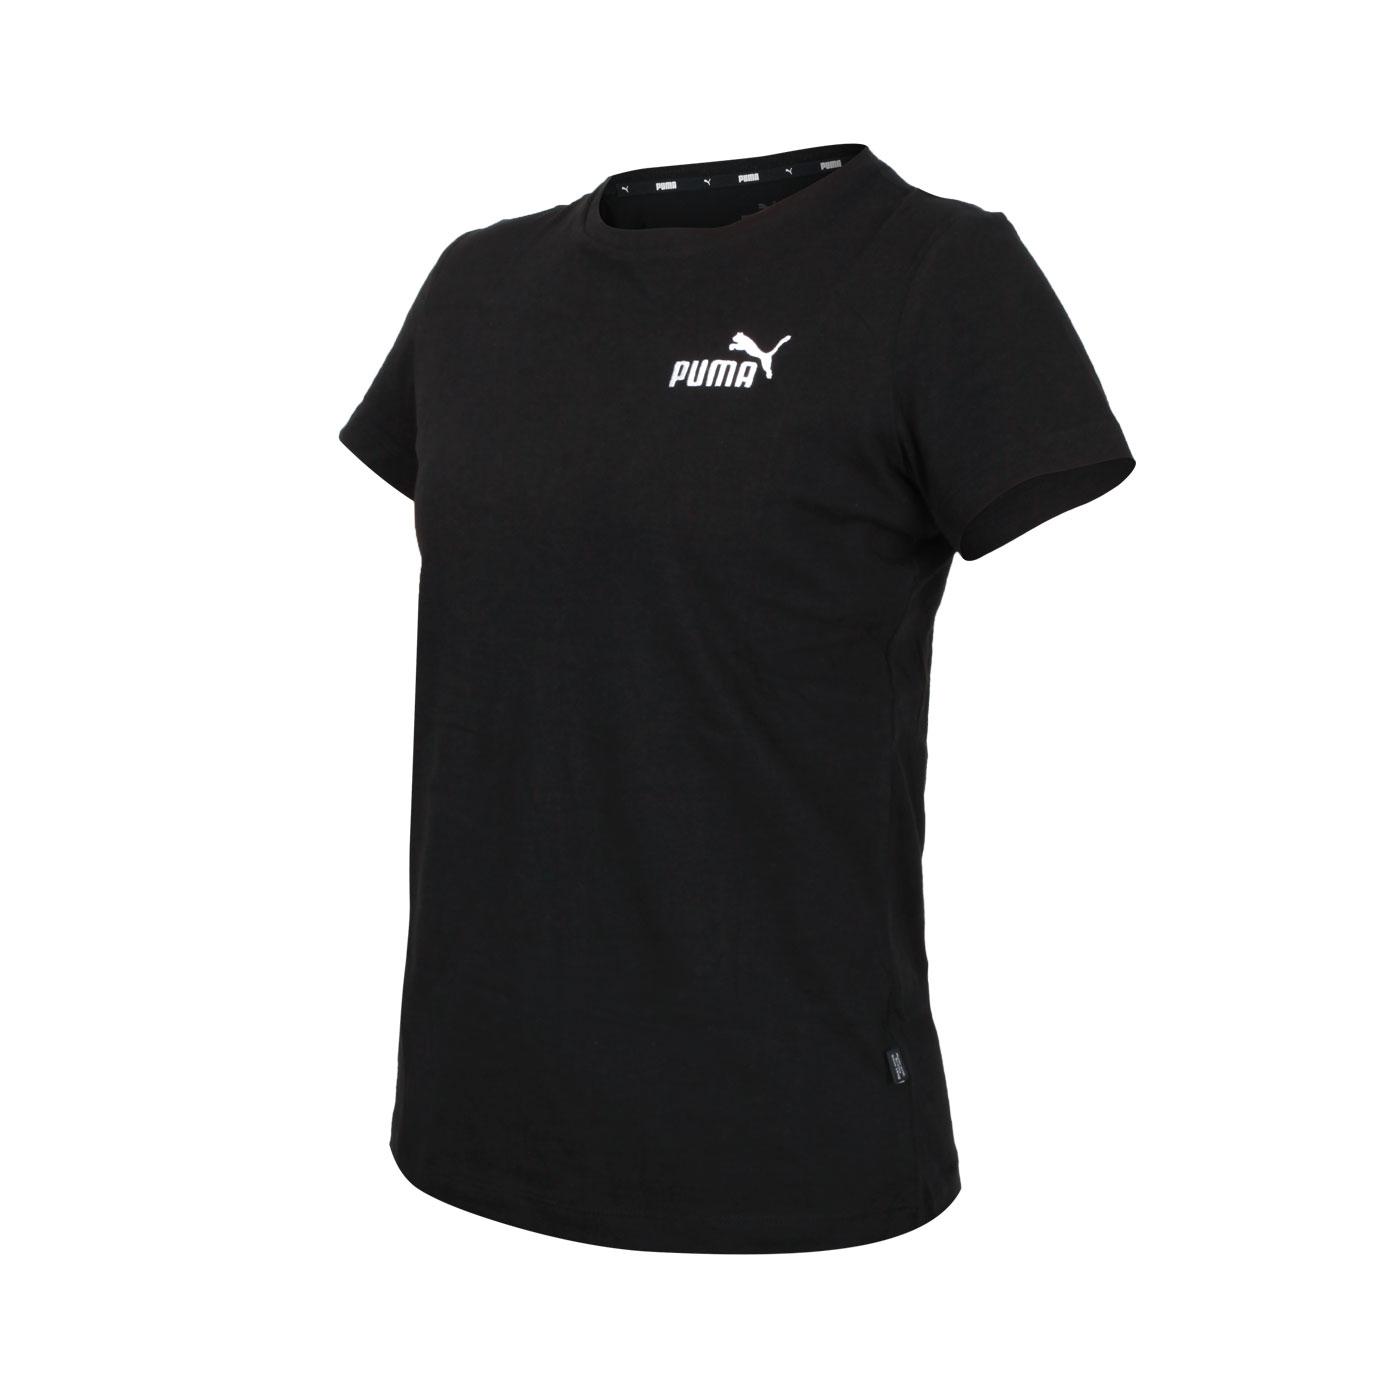 PUMA 女款基本系列Ess刺繡短袖T恤 58790151